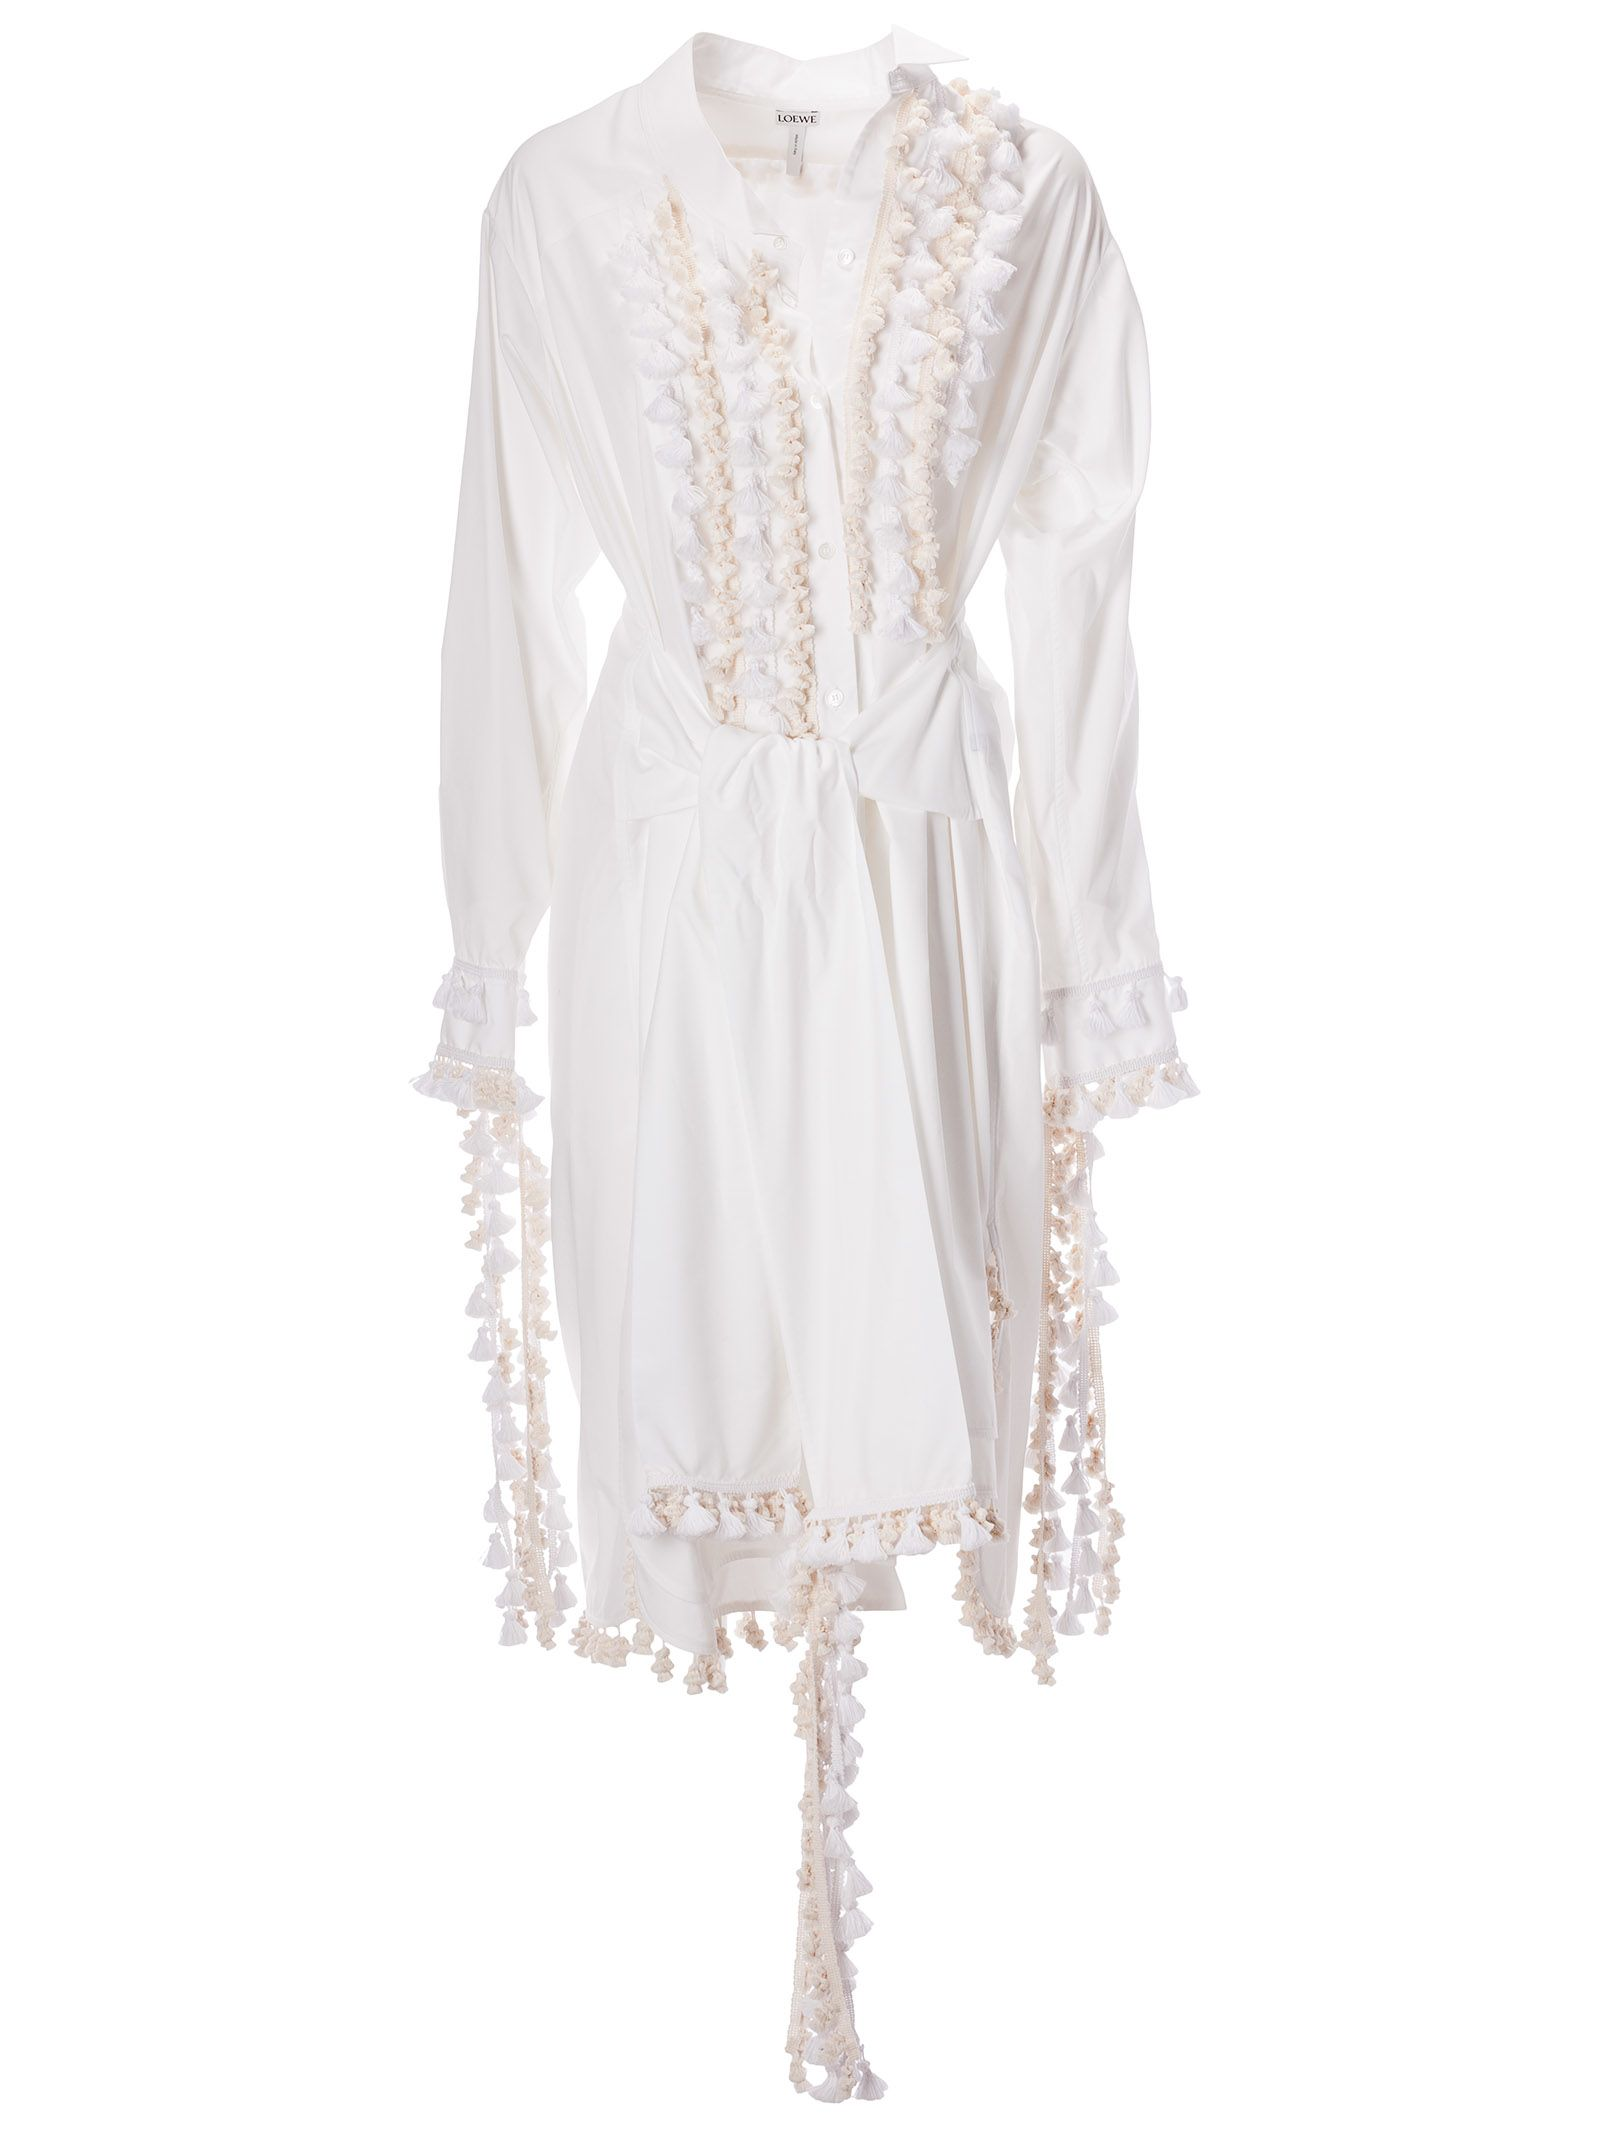 7fdc07d77de Loewe Loewe Tassel Embellished Shirt Dress - White - 10806481